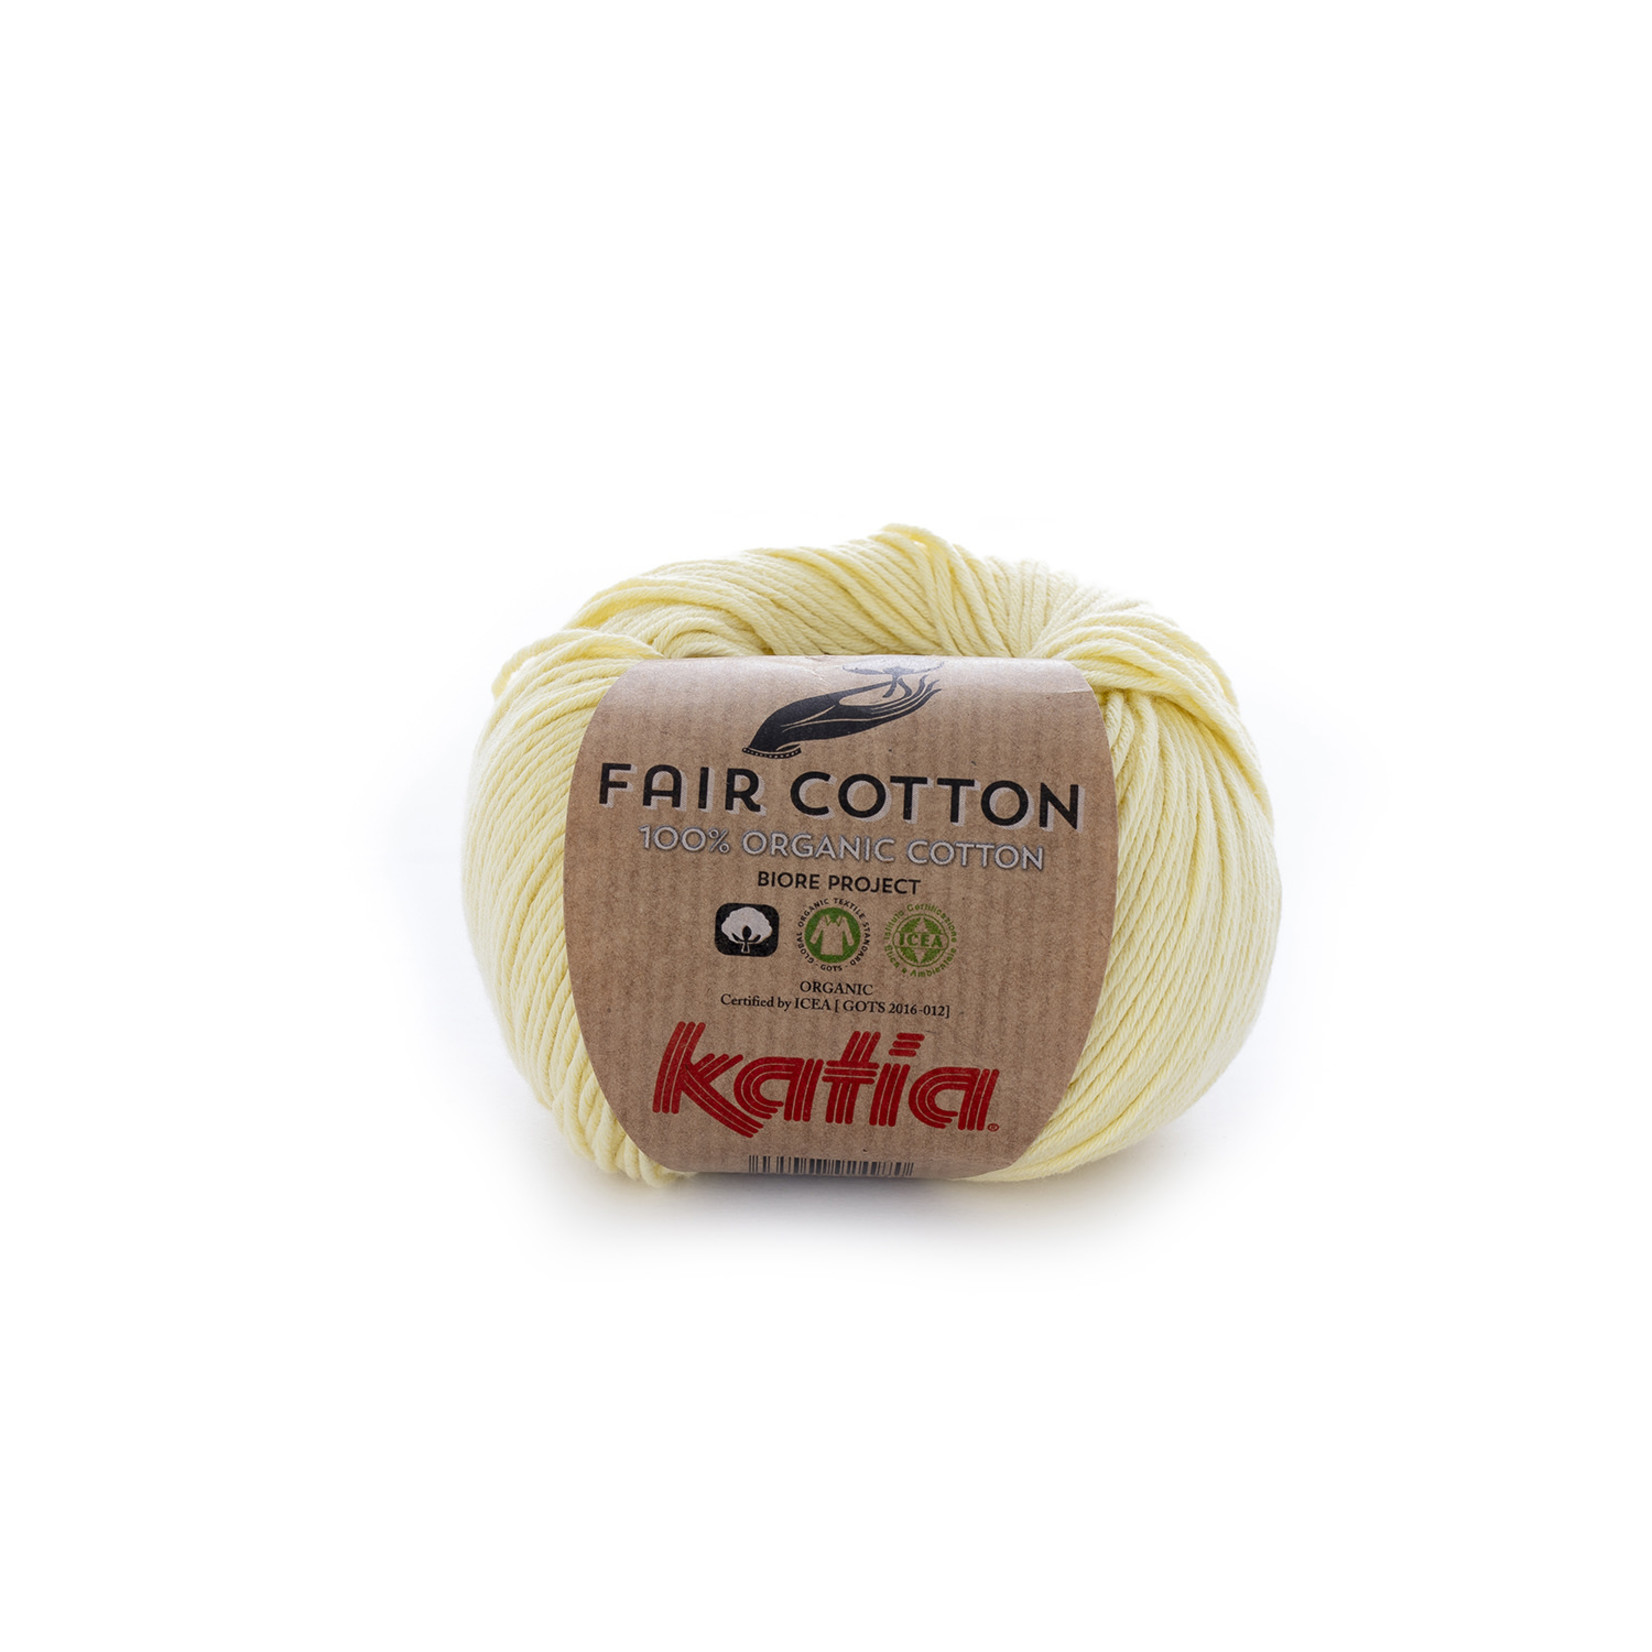 Katia Katia Fair Cotton 7 - lichtgeel - 1 bol = 50 gr. = 155 m. - 100% biol. katoen